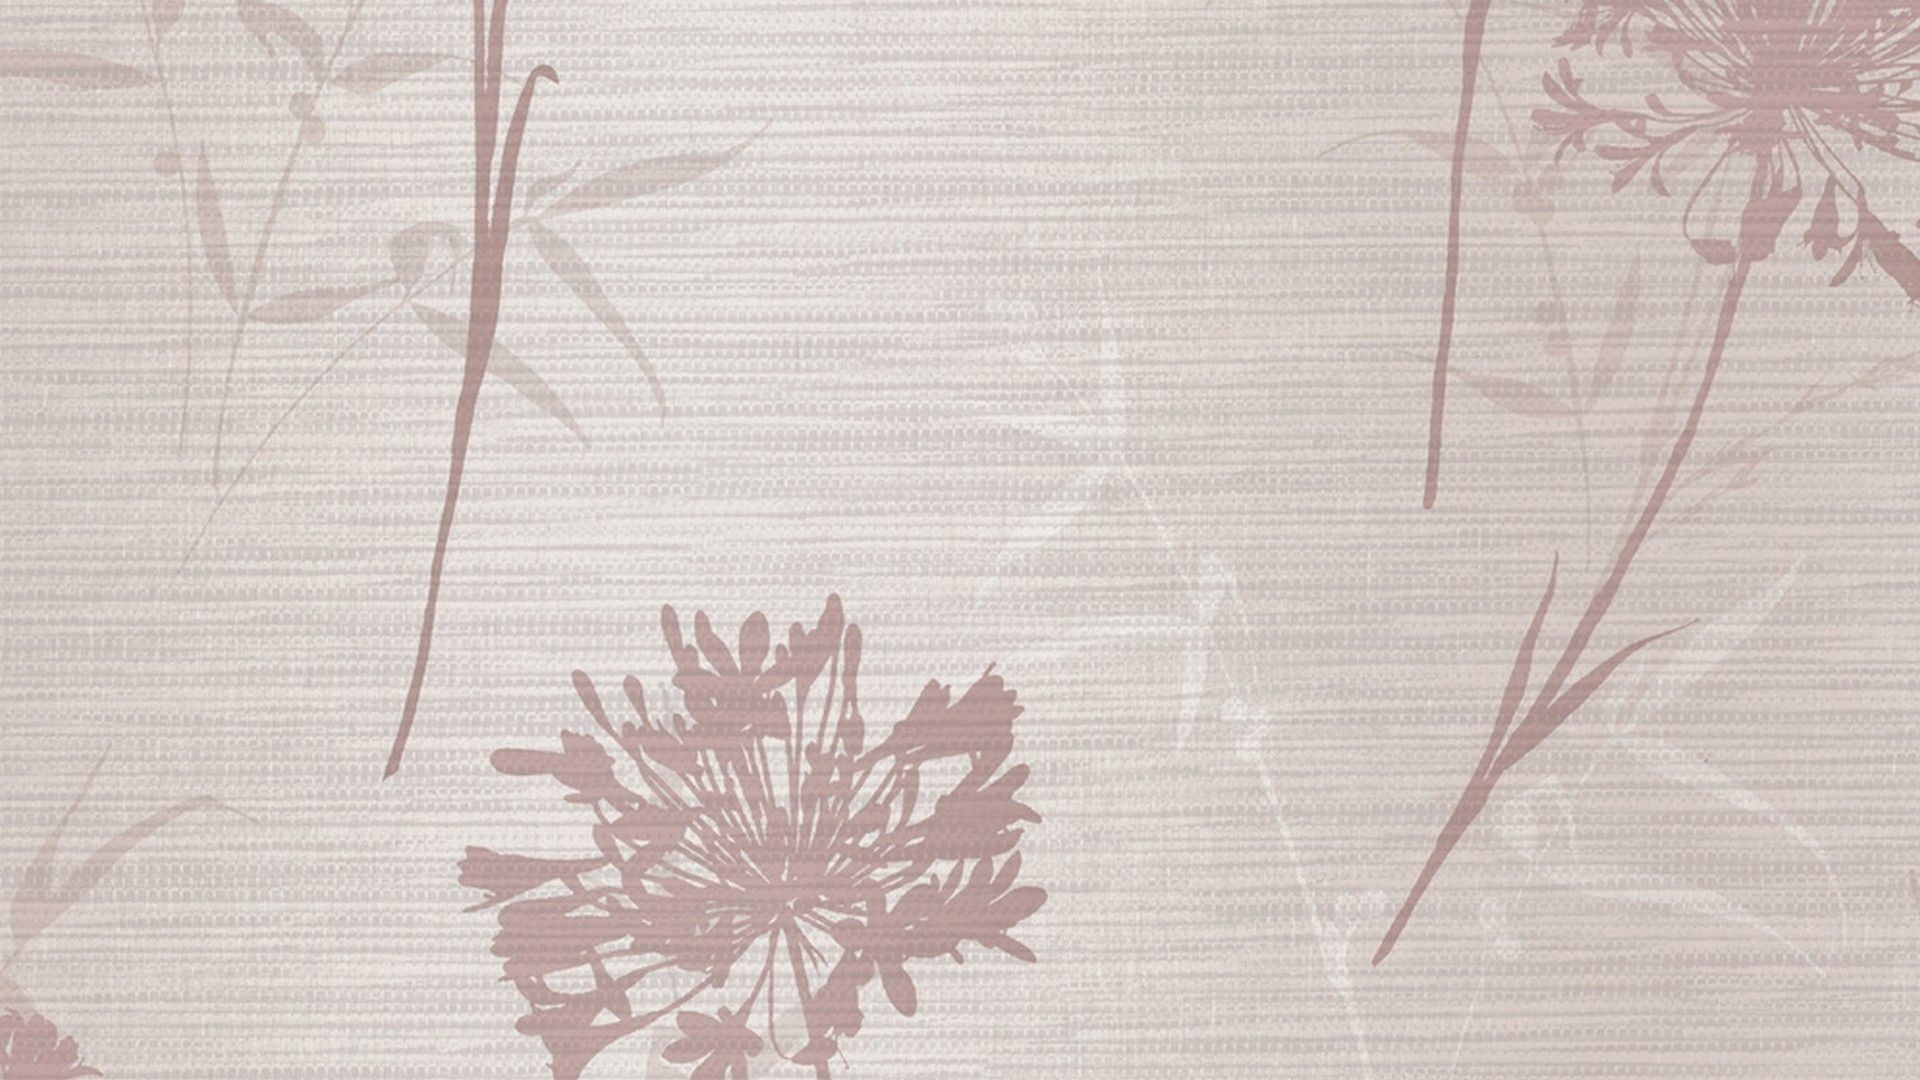 Rose Gold Aesthetics Computer Wallpapers On Wallpaperdog